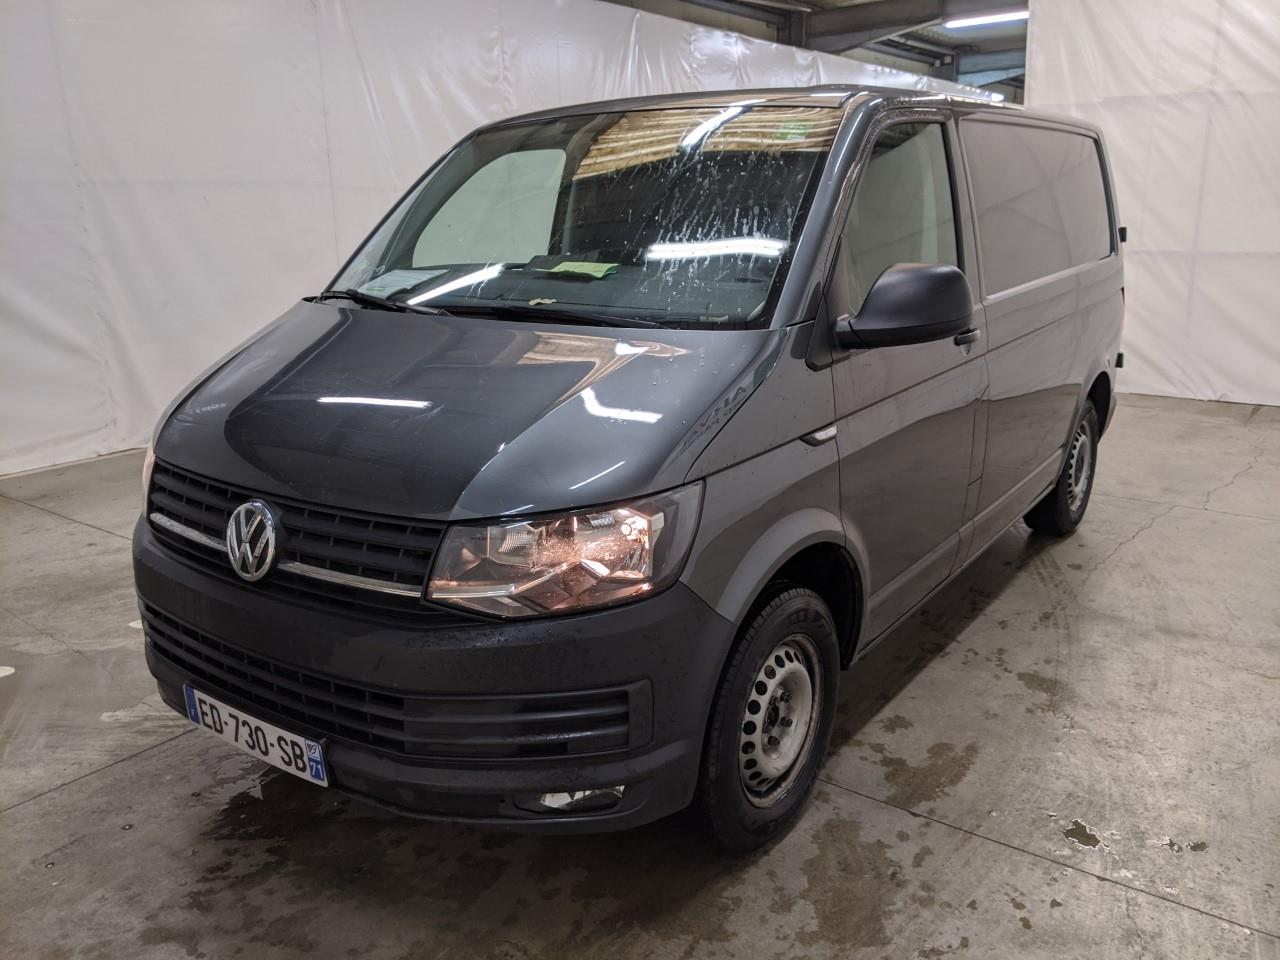 Volkswagen Transporter  VOLKSWAGEN Transporter VU 4p Fourgon 2.0 TDi 140 L1H1 Business Line // PM